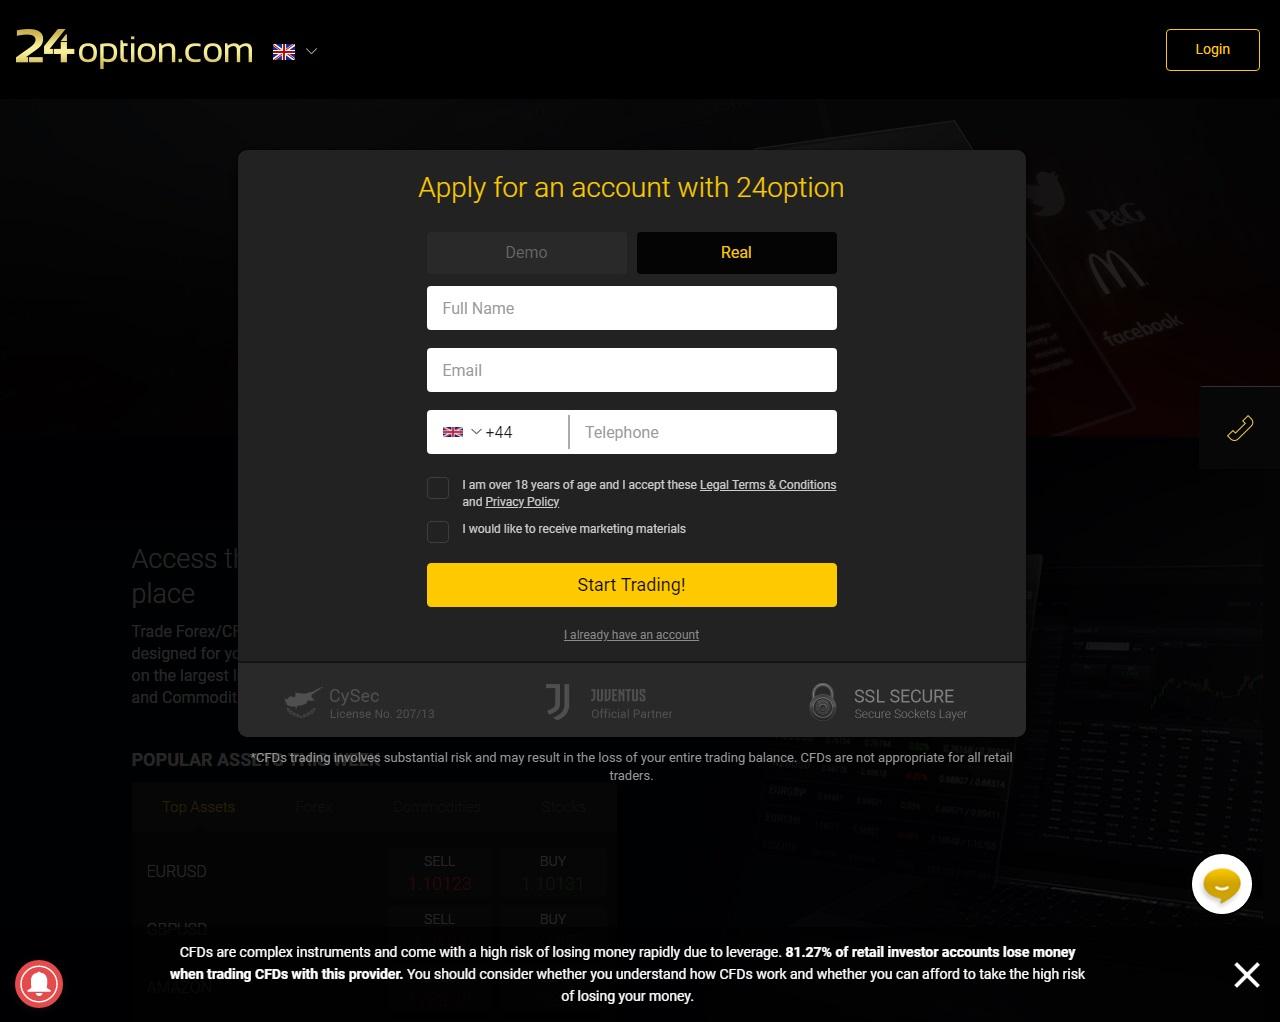 24option registration page